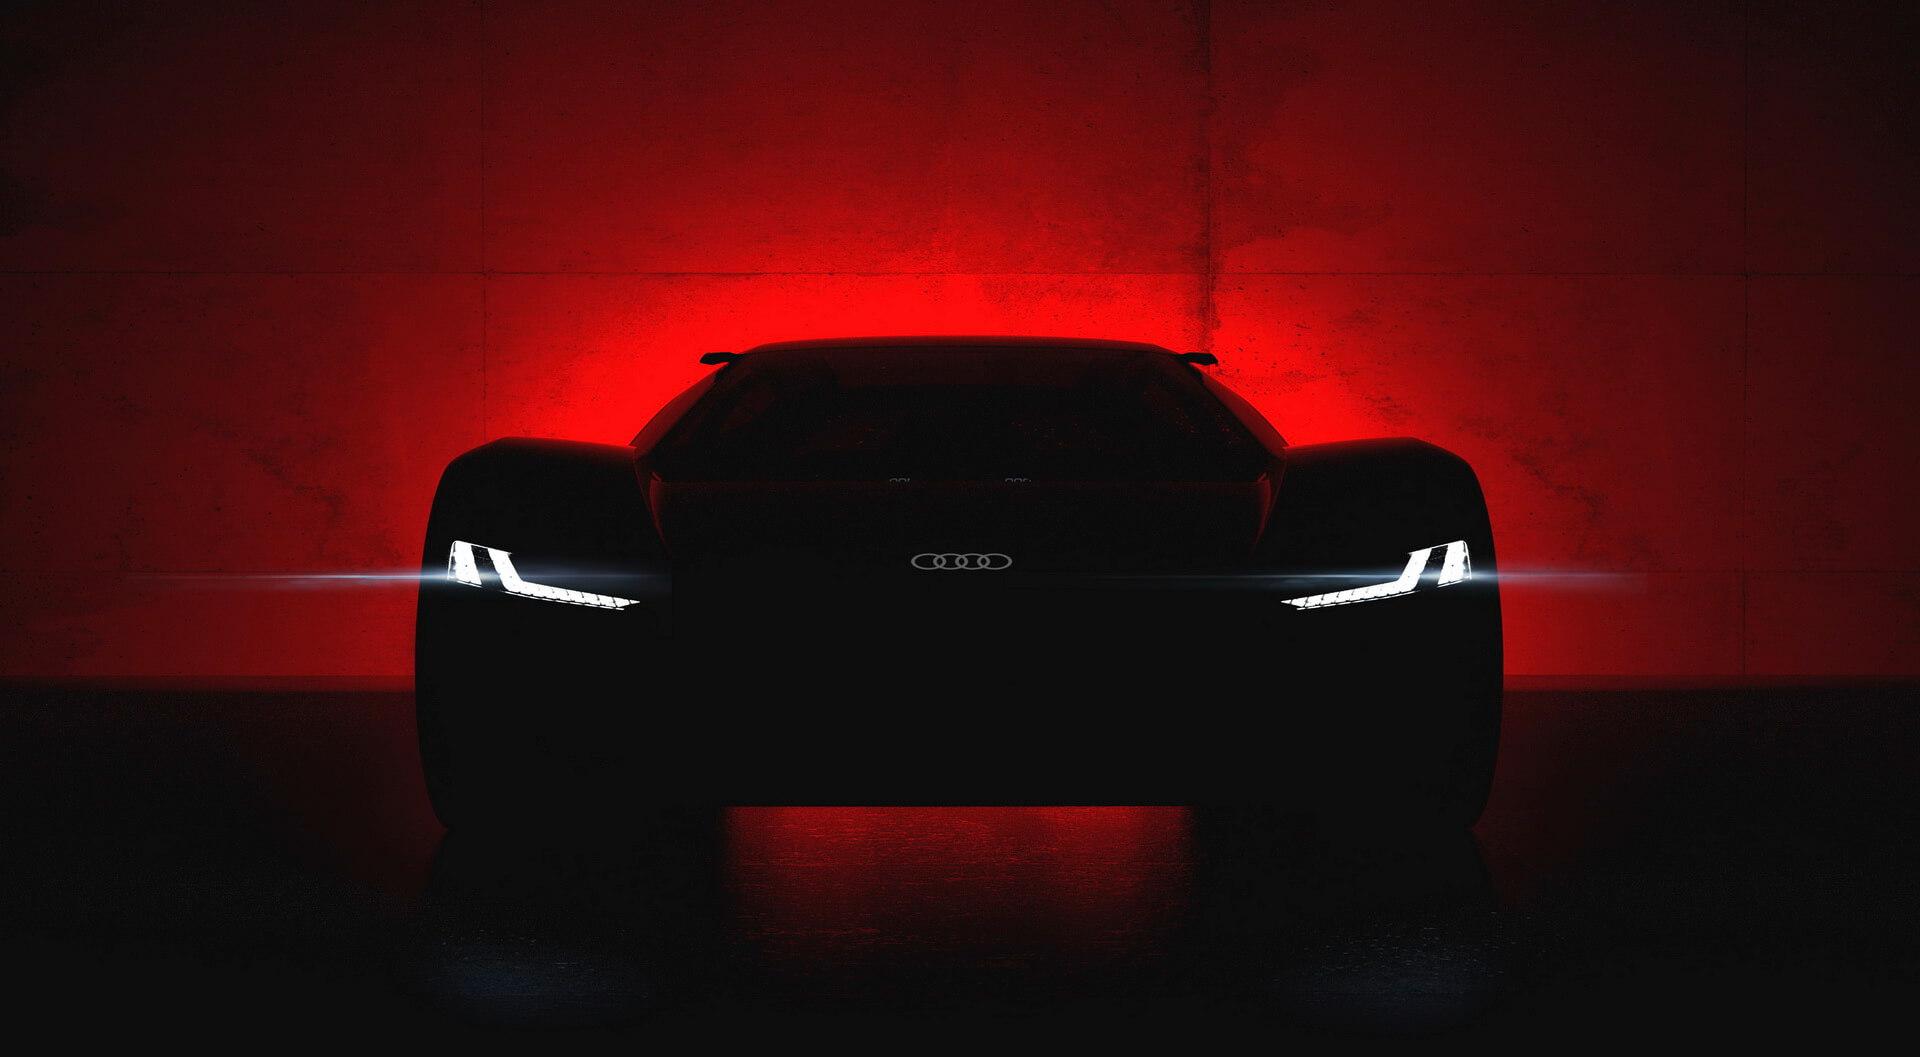 Концепт электрического спорткара Audi PB 18 e-tron